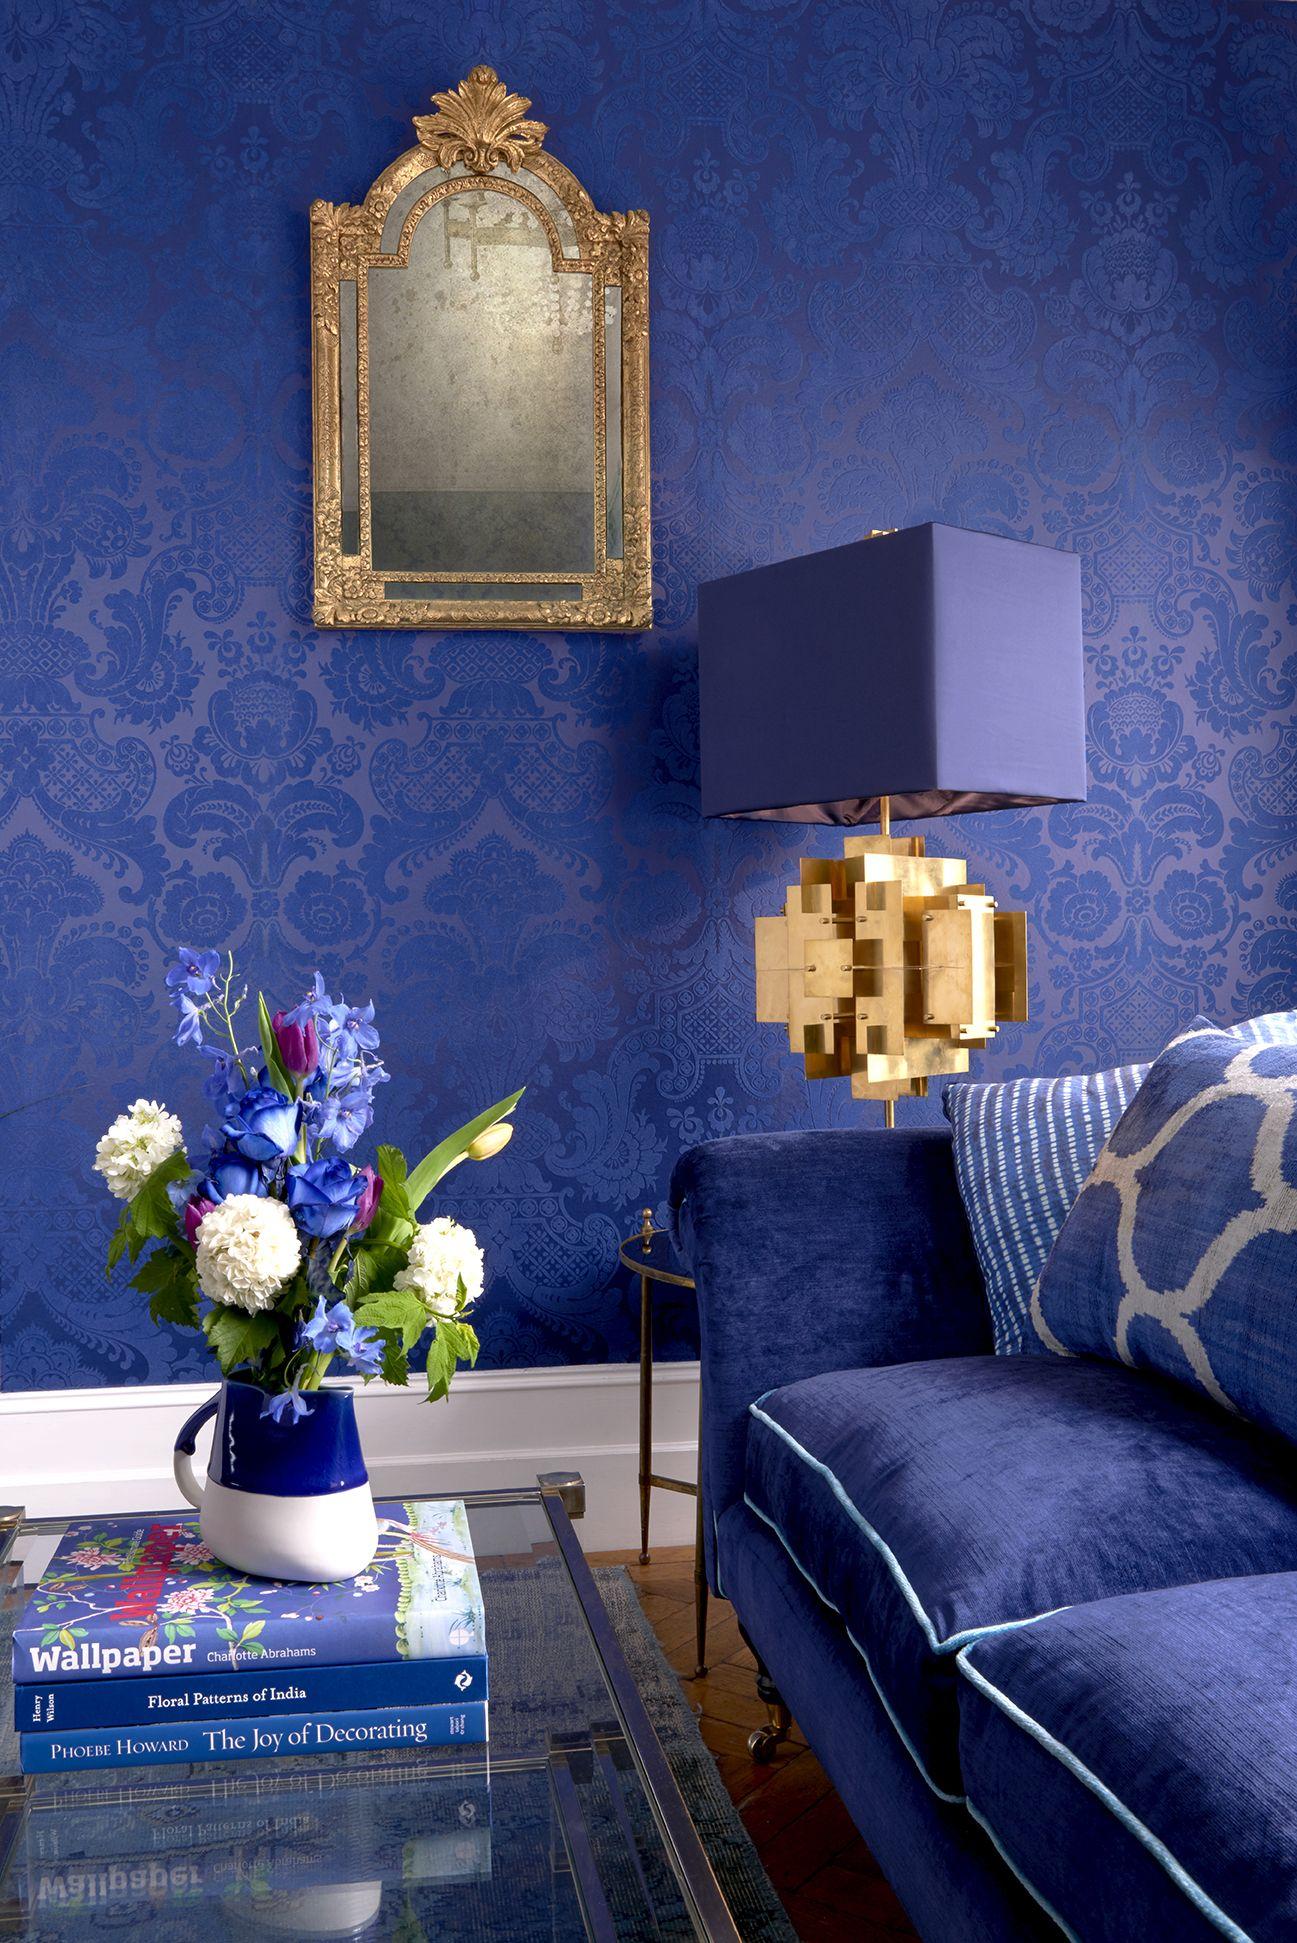 Wanders blue wanders forest flocked wallpaper damask wallpaper - Mariinsky Petrouchka Flock Wallpaper In Five Colour Ways Pictured Here In Indigo Blue